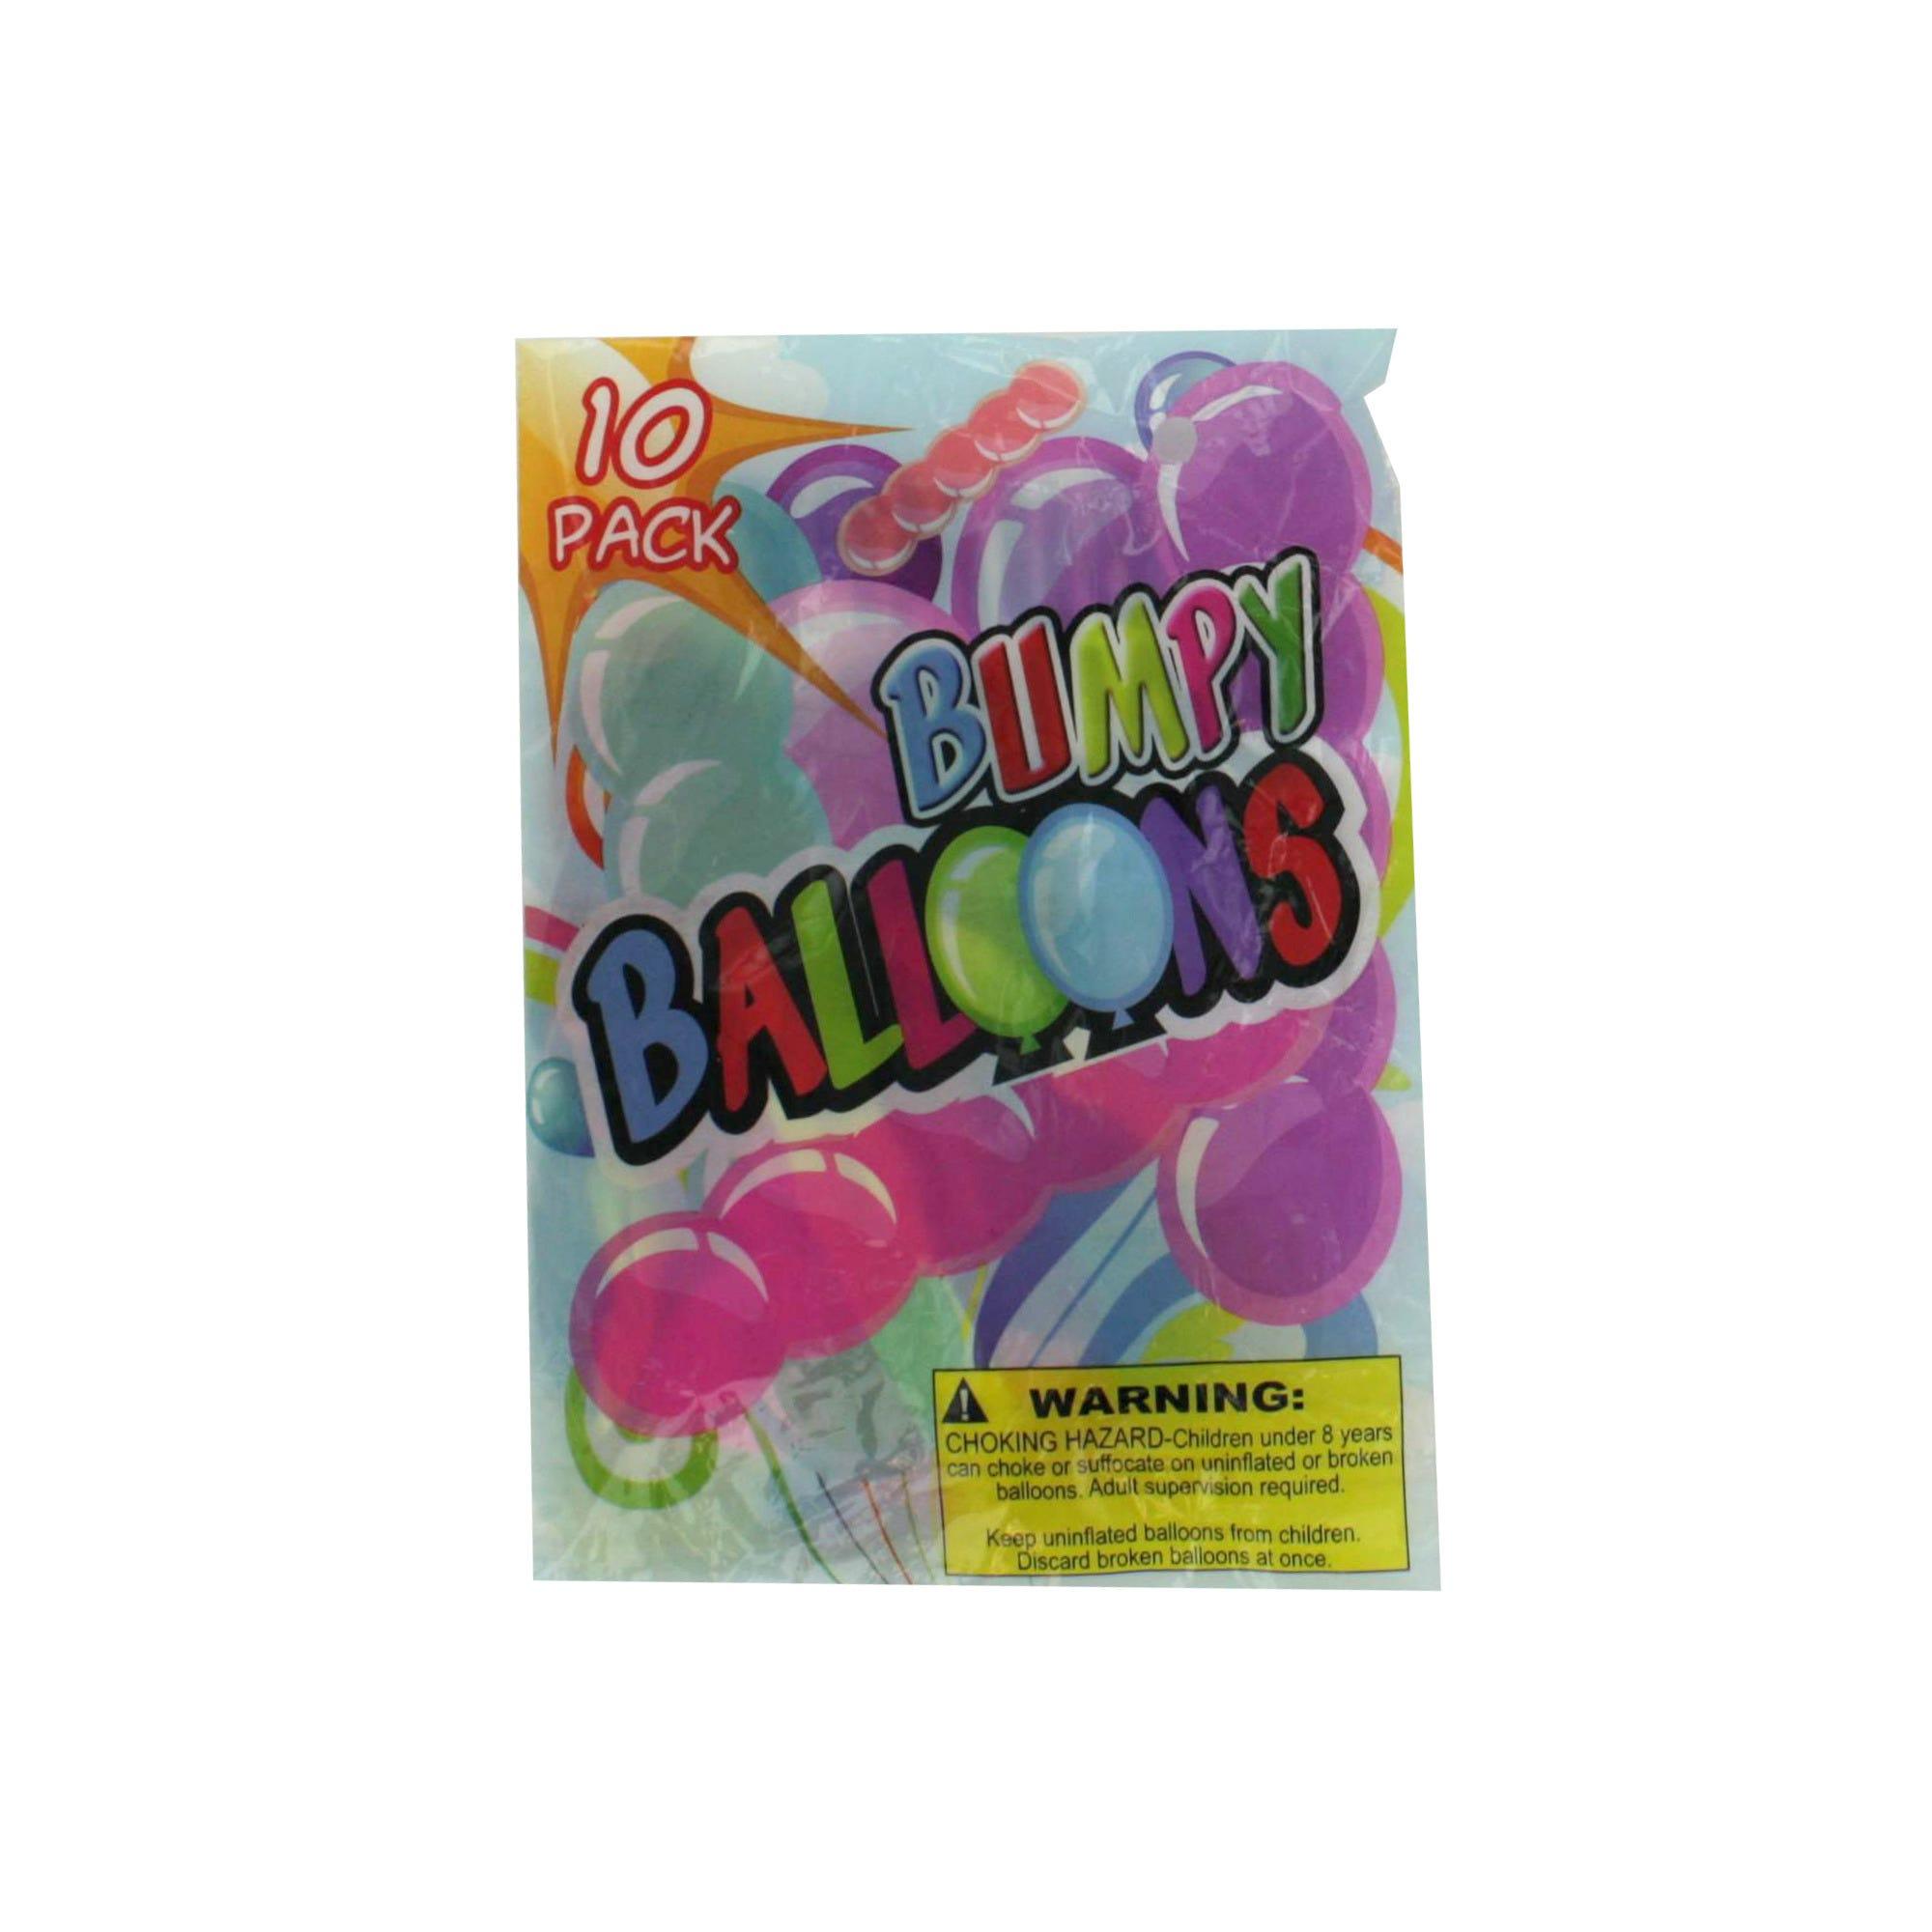 giant-bumpy-BALLOONs